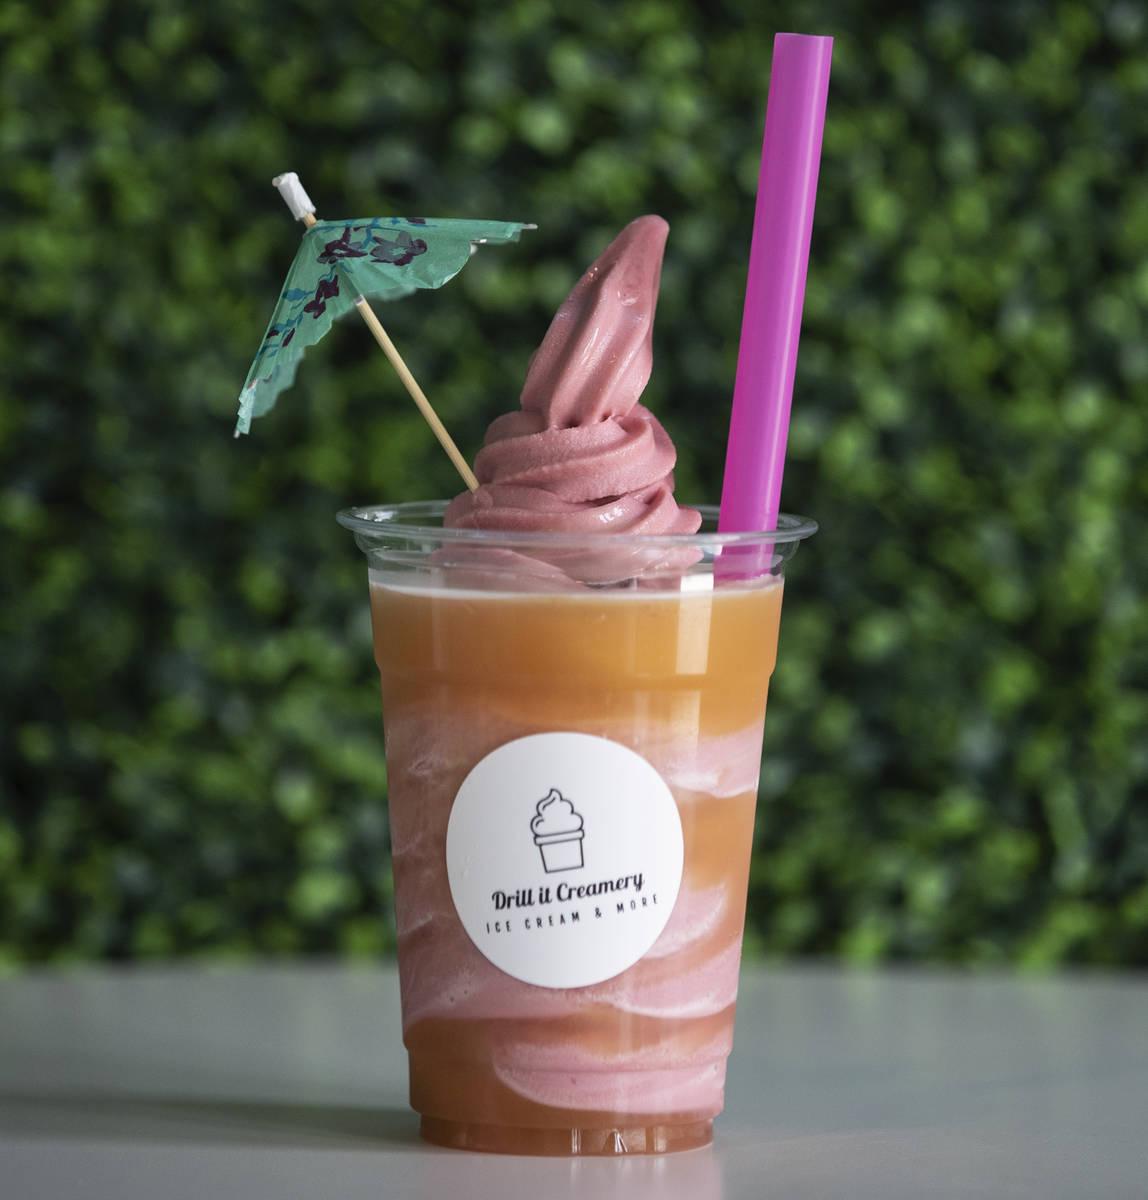 Strawberry pina colada dole float is displayed at Drill It Creamery in Las Vegas. (Bizuayehu Te ...